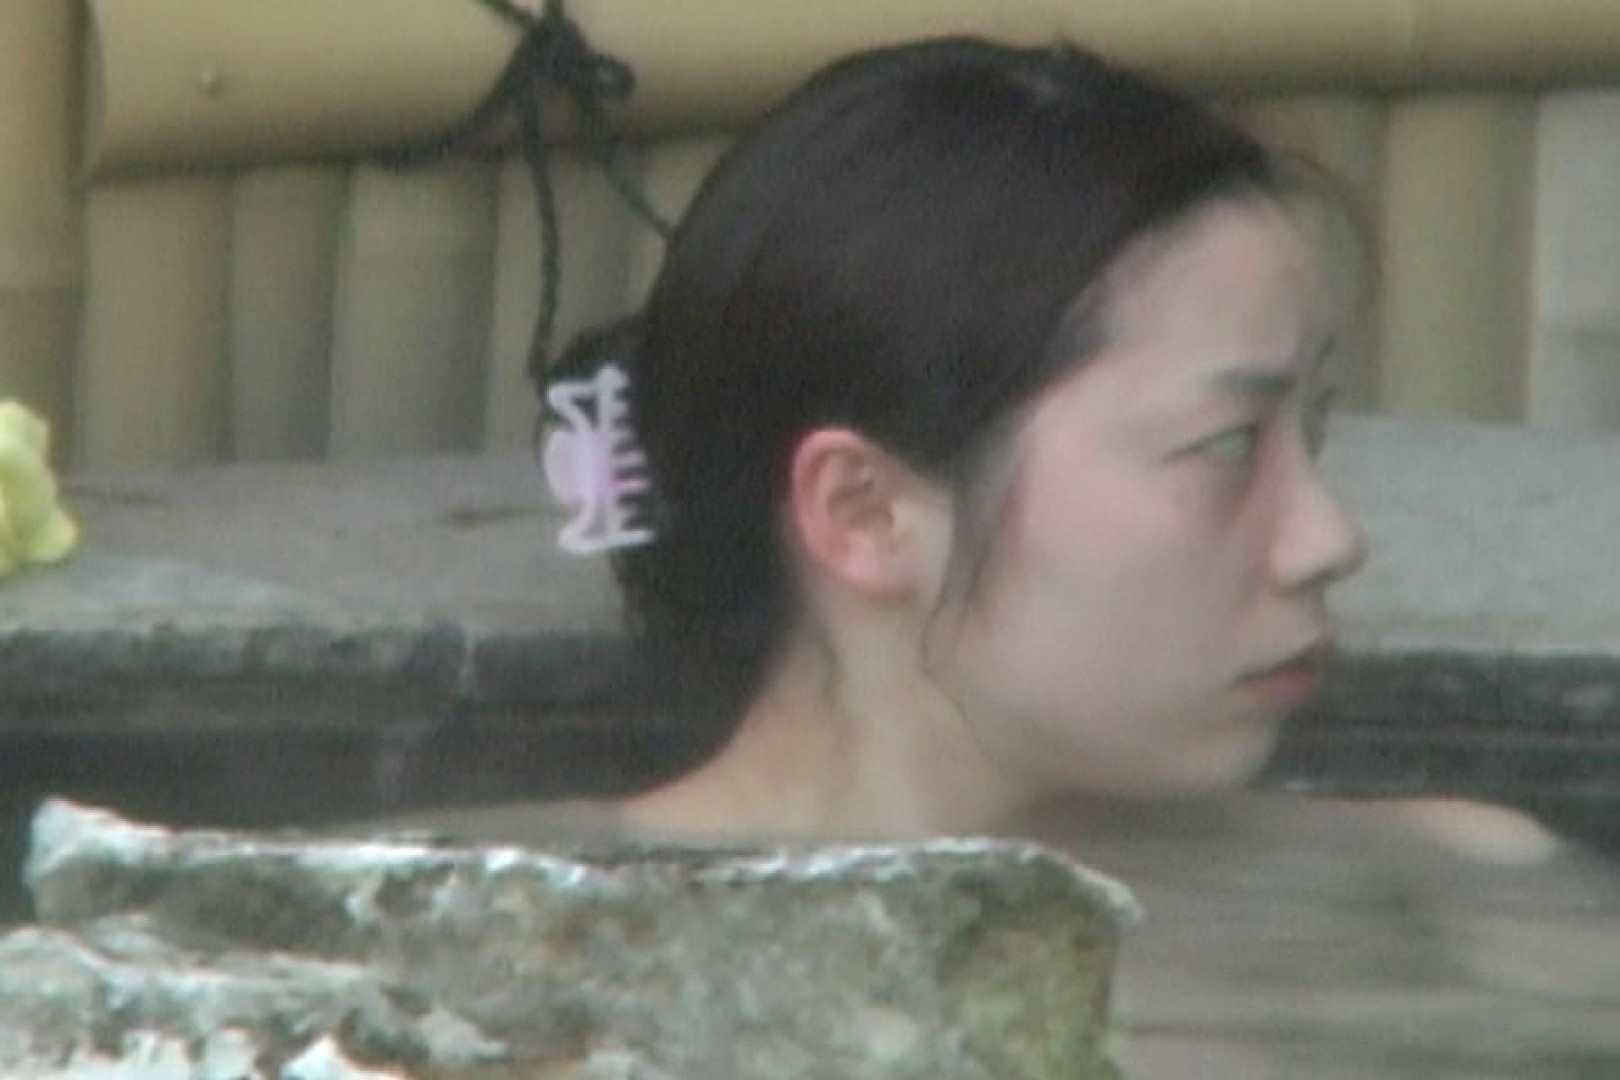 Aquaな露天風呂Vol.596 盗撮シリーズ | 露天風呂編  113PIX 21